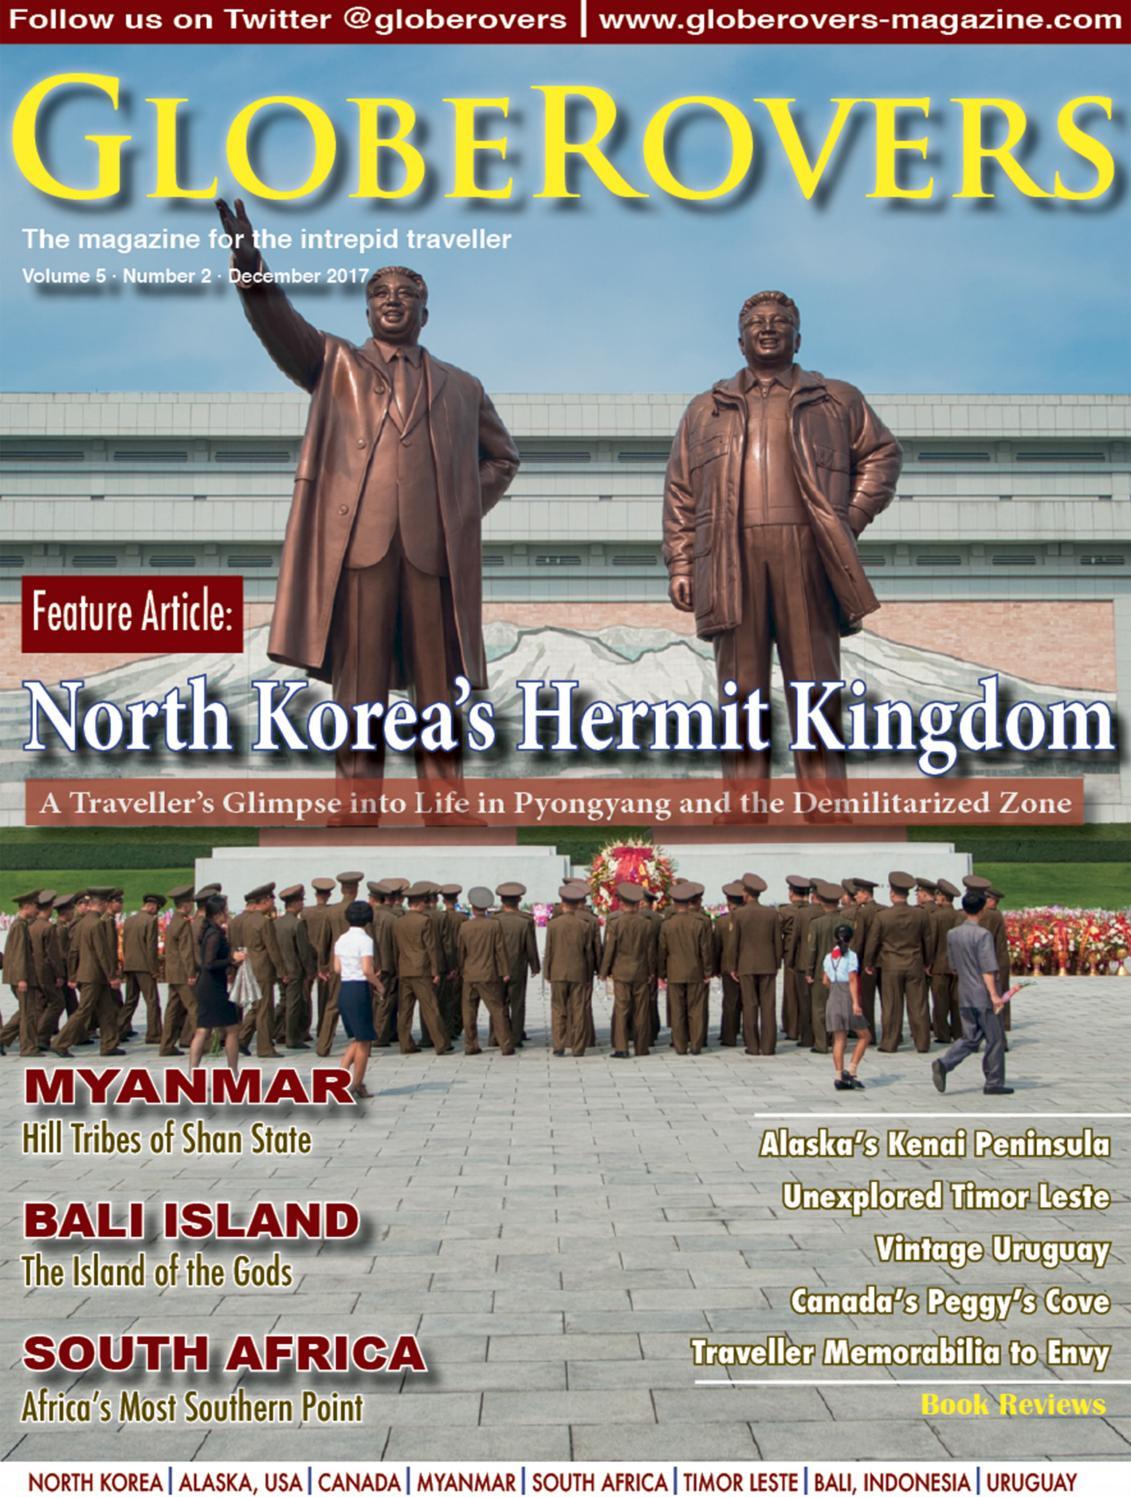 ef0c4387efc Globerovers Magazine, Dec. 2017 by Globerovers Magazine - issuu